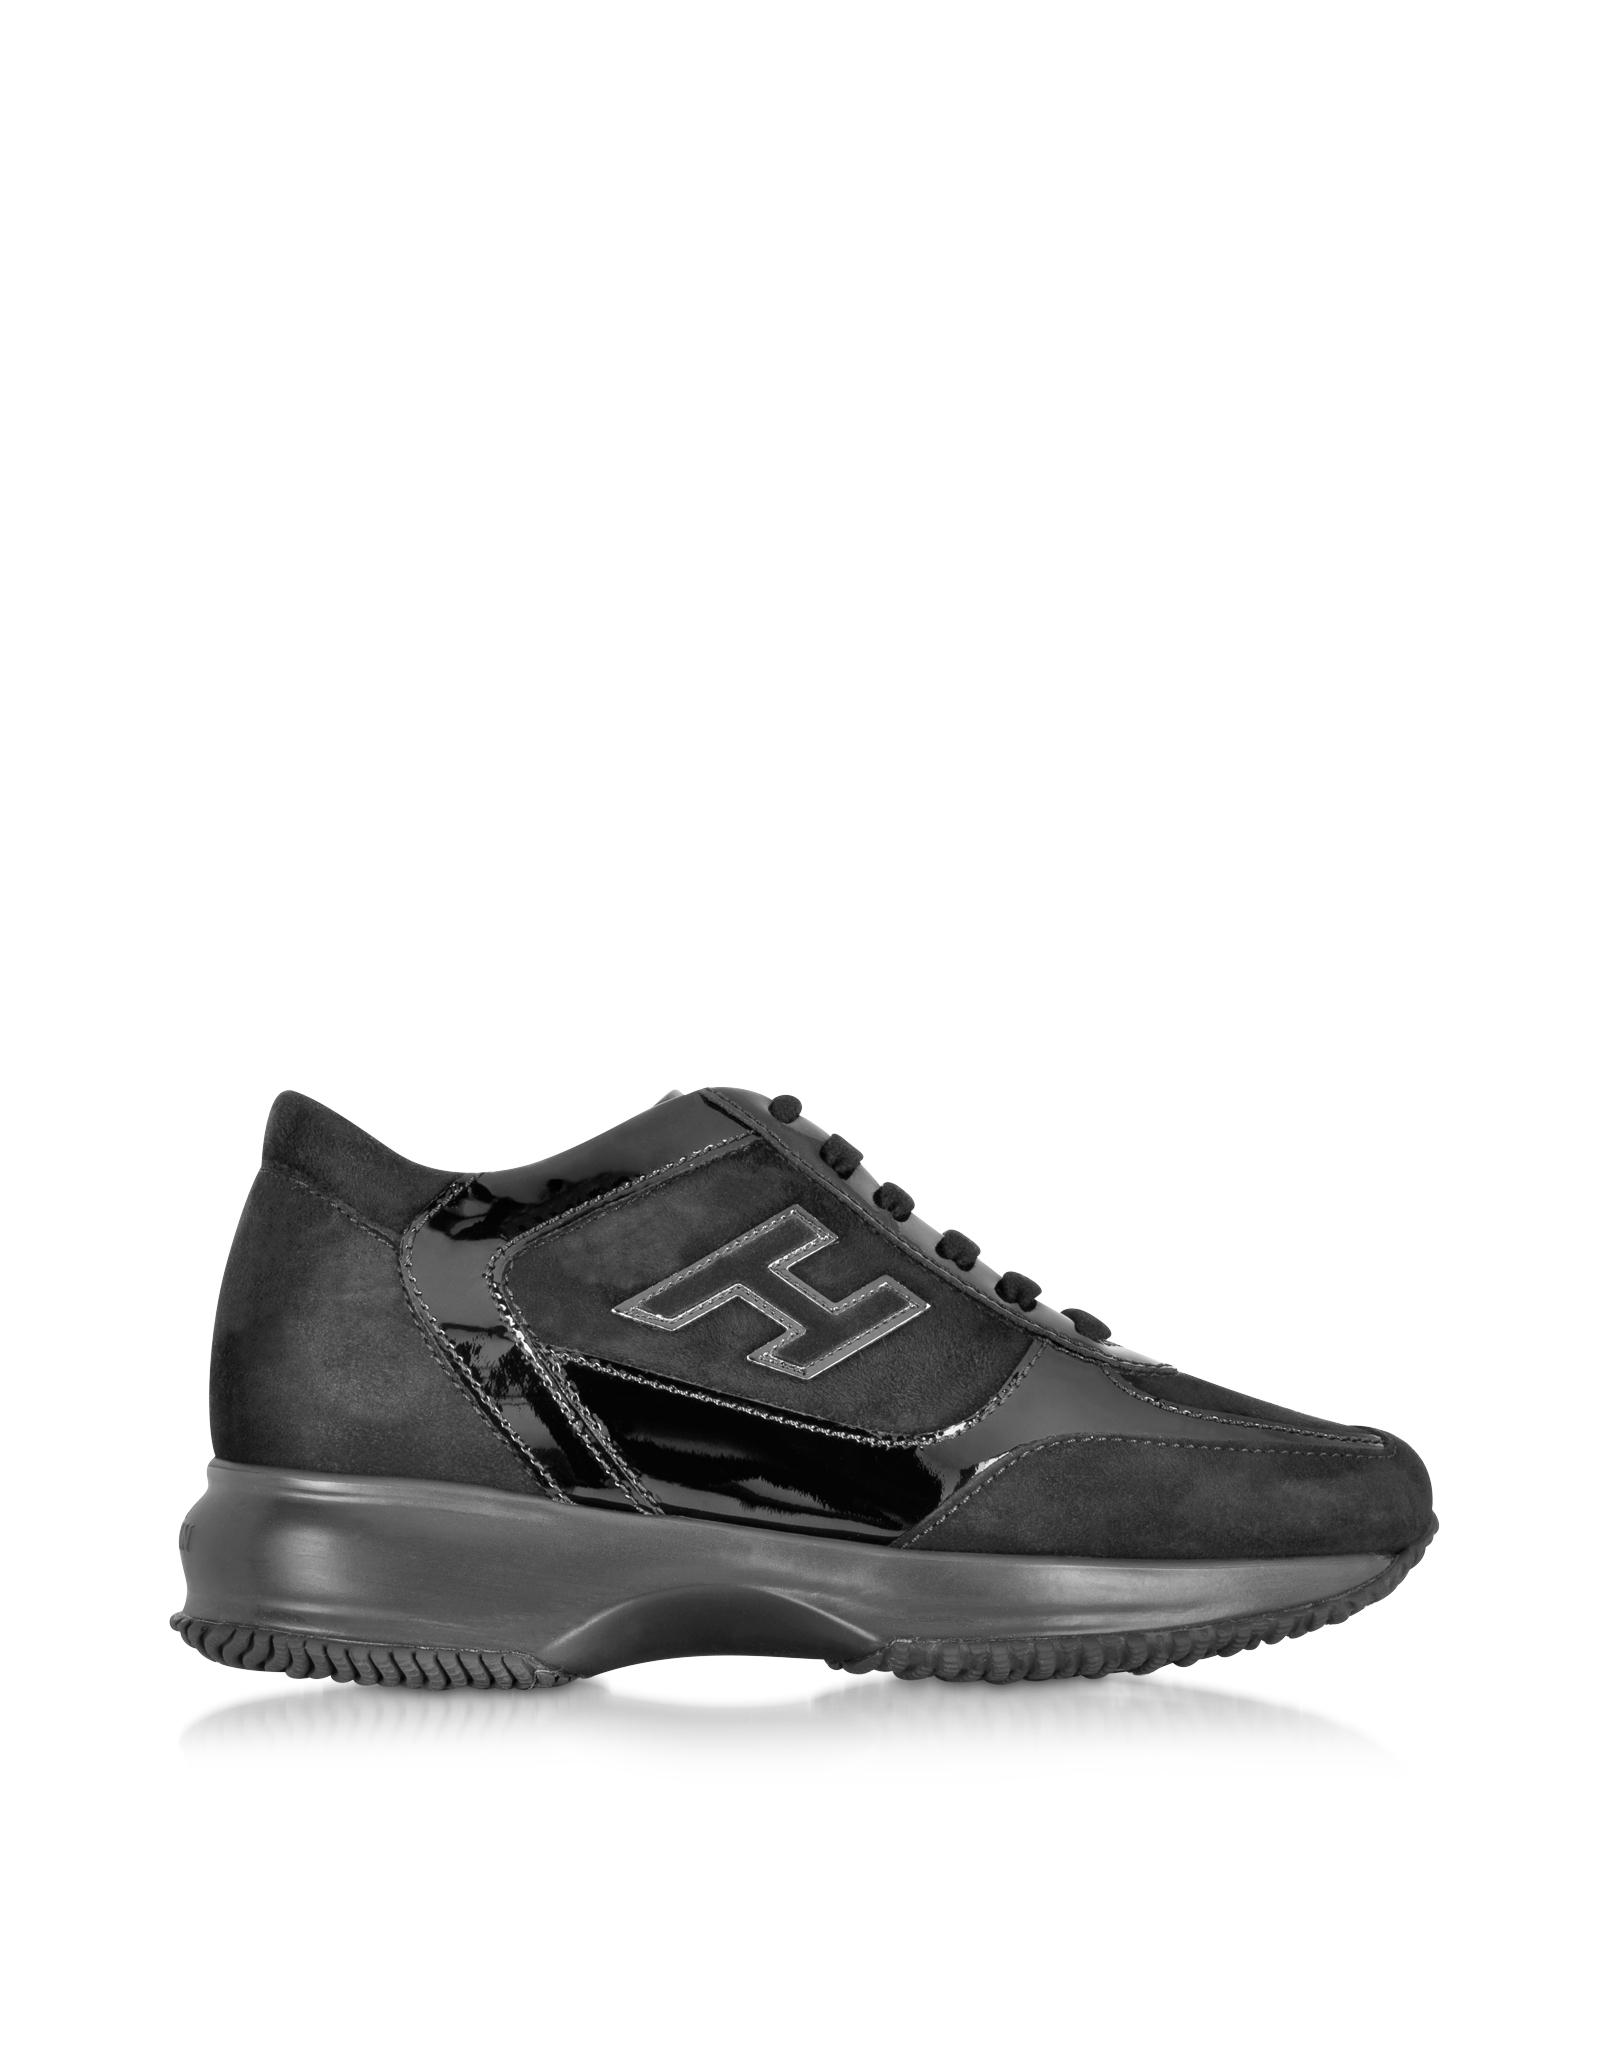 90 reviews of DSW Designer Shoe Warehouse